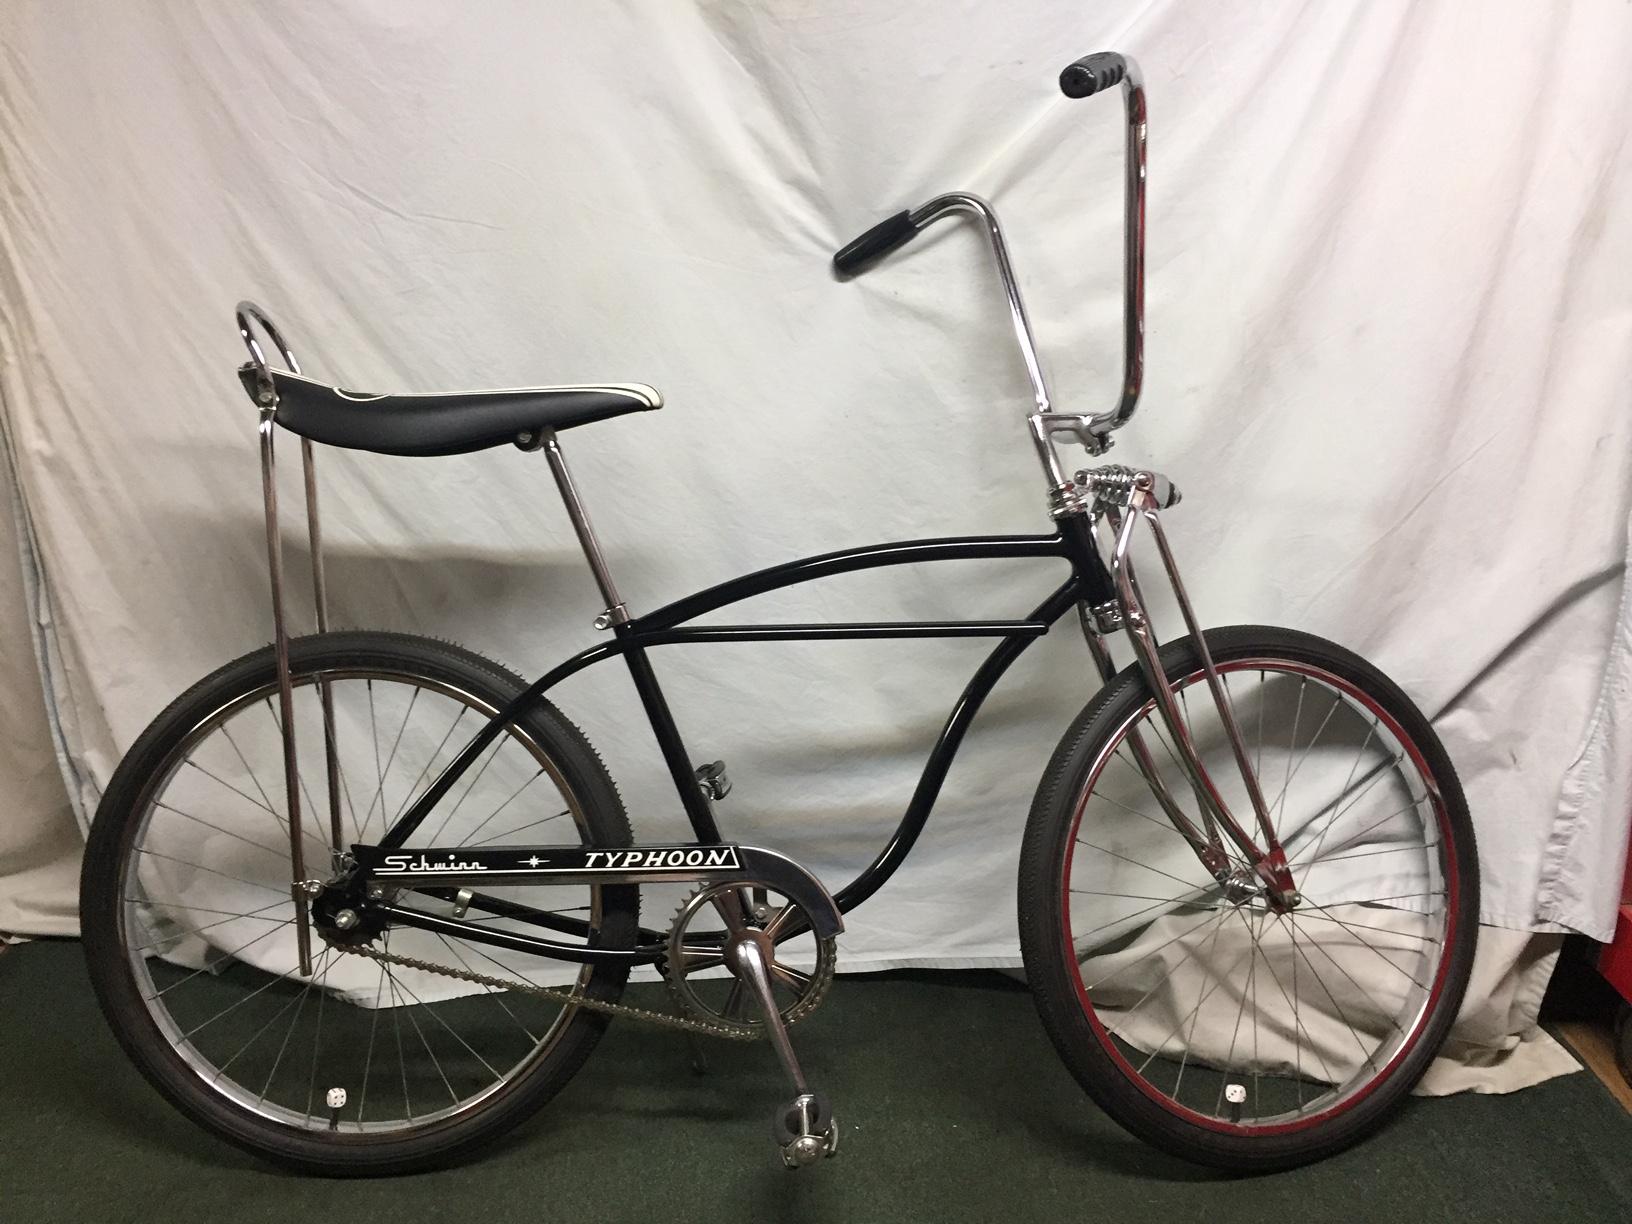 Schwinn Stingray Krate Super Deluxe Cruiser Bicycle Spring Fork Fender Bracket